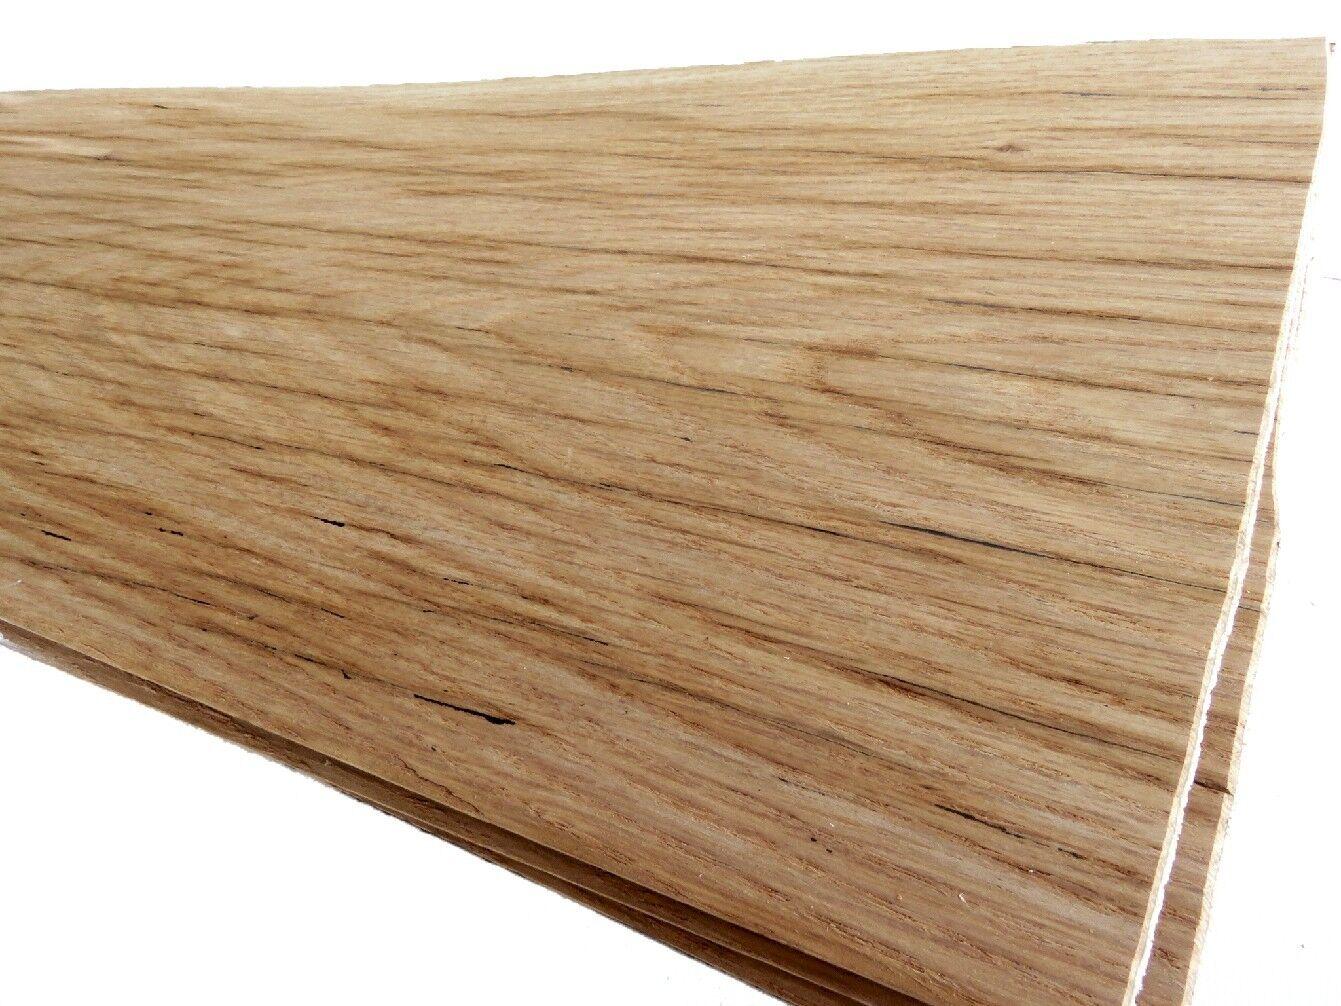 4 x furnier eiche antik 2 0mm starkfurnier holz brett regal board wand balken furniere holz. Black Bedroom Furniture Sets. Home Design Ideas